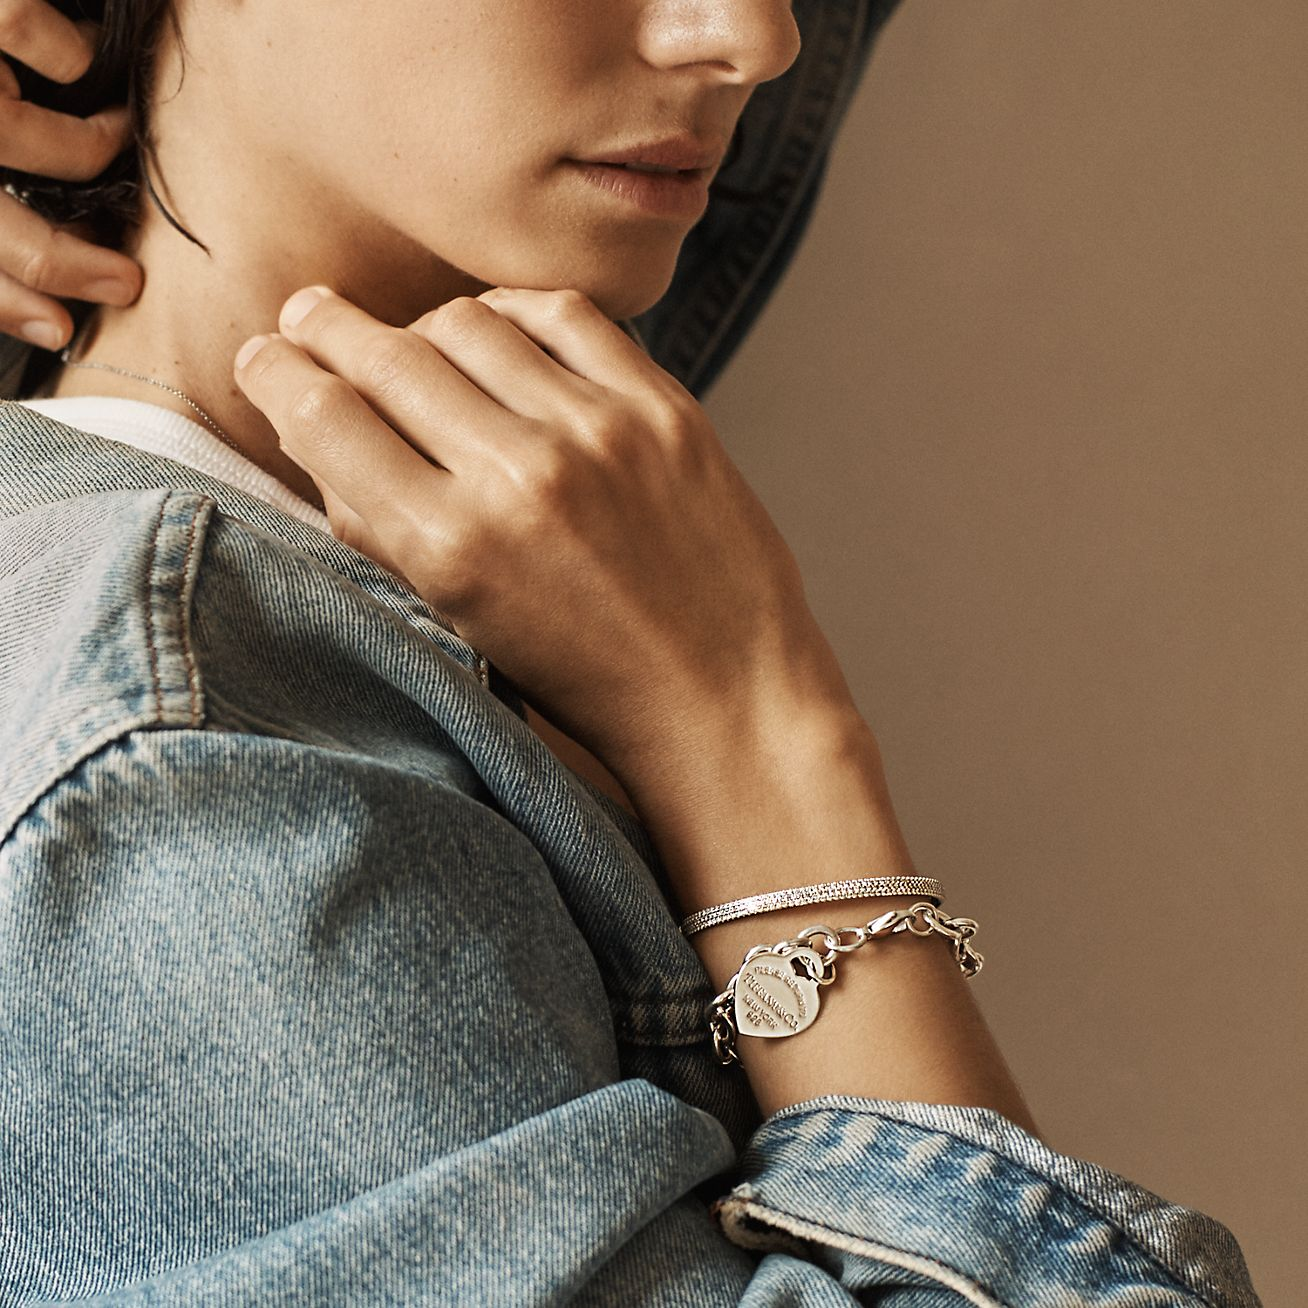 cute bracelet circles bracelet charm bracelet Silver bracelet box chain bracelet everyday wear silver bracelet sterling bracelet